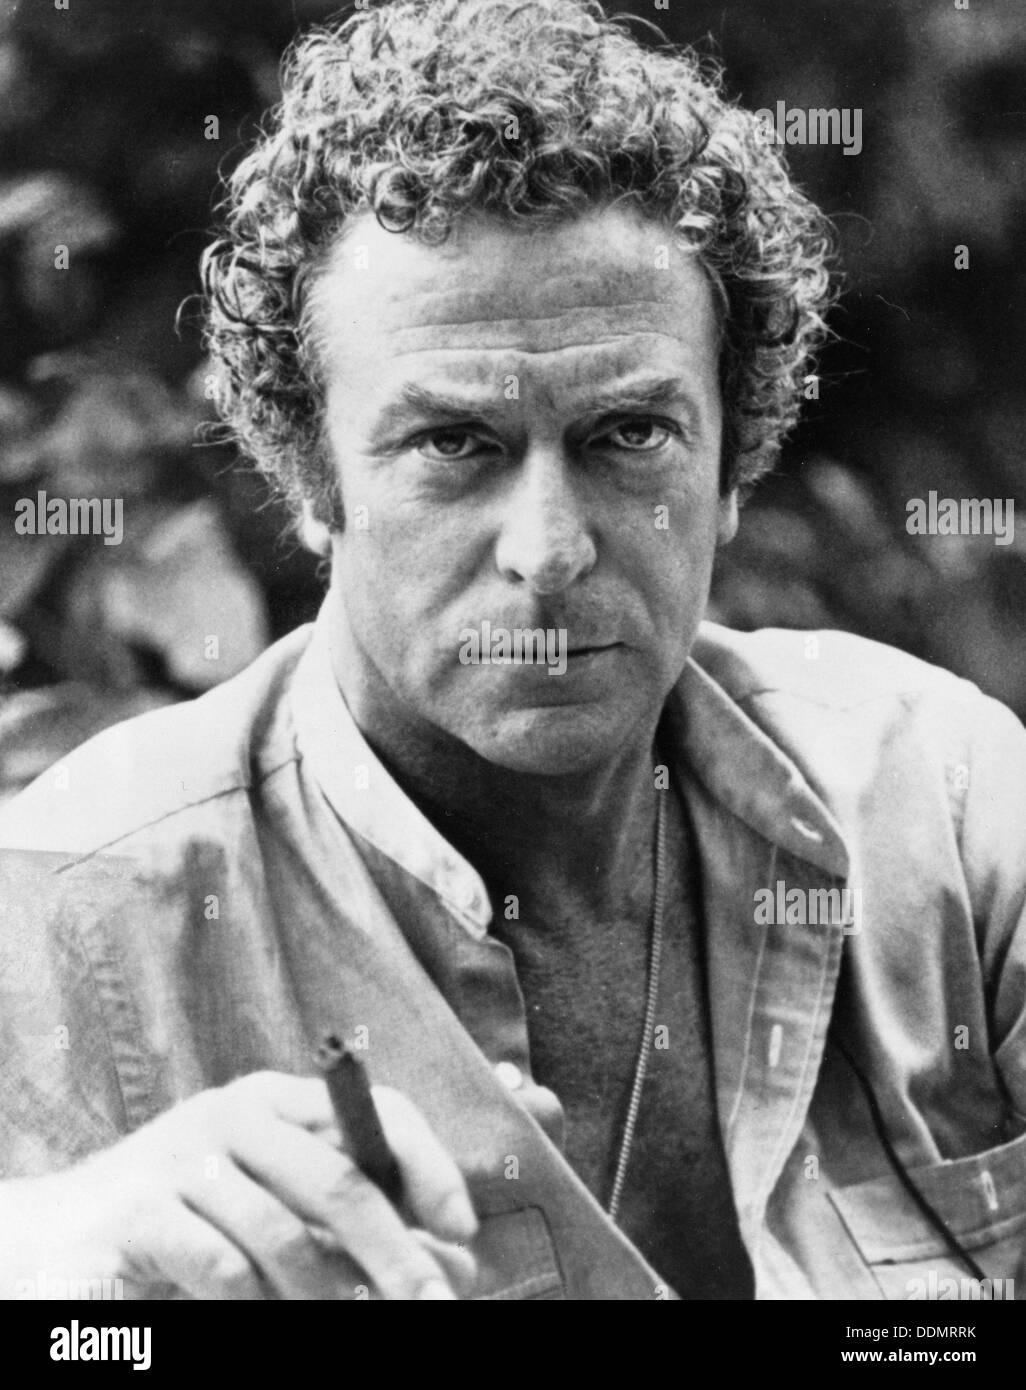 Michael Caine (1933- ), British actor, 1989. - Stock Image